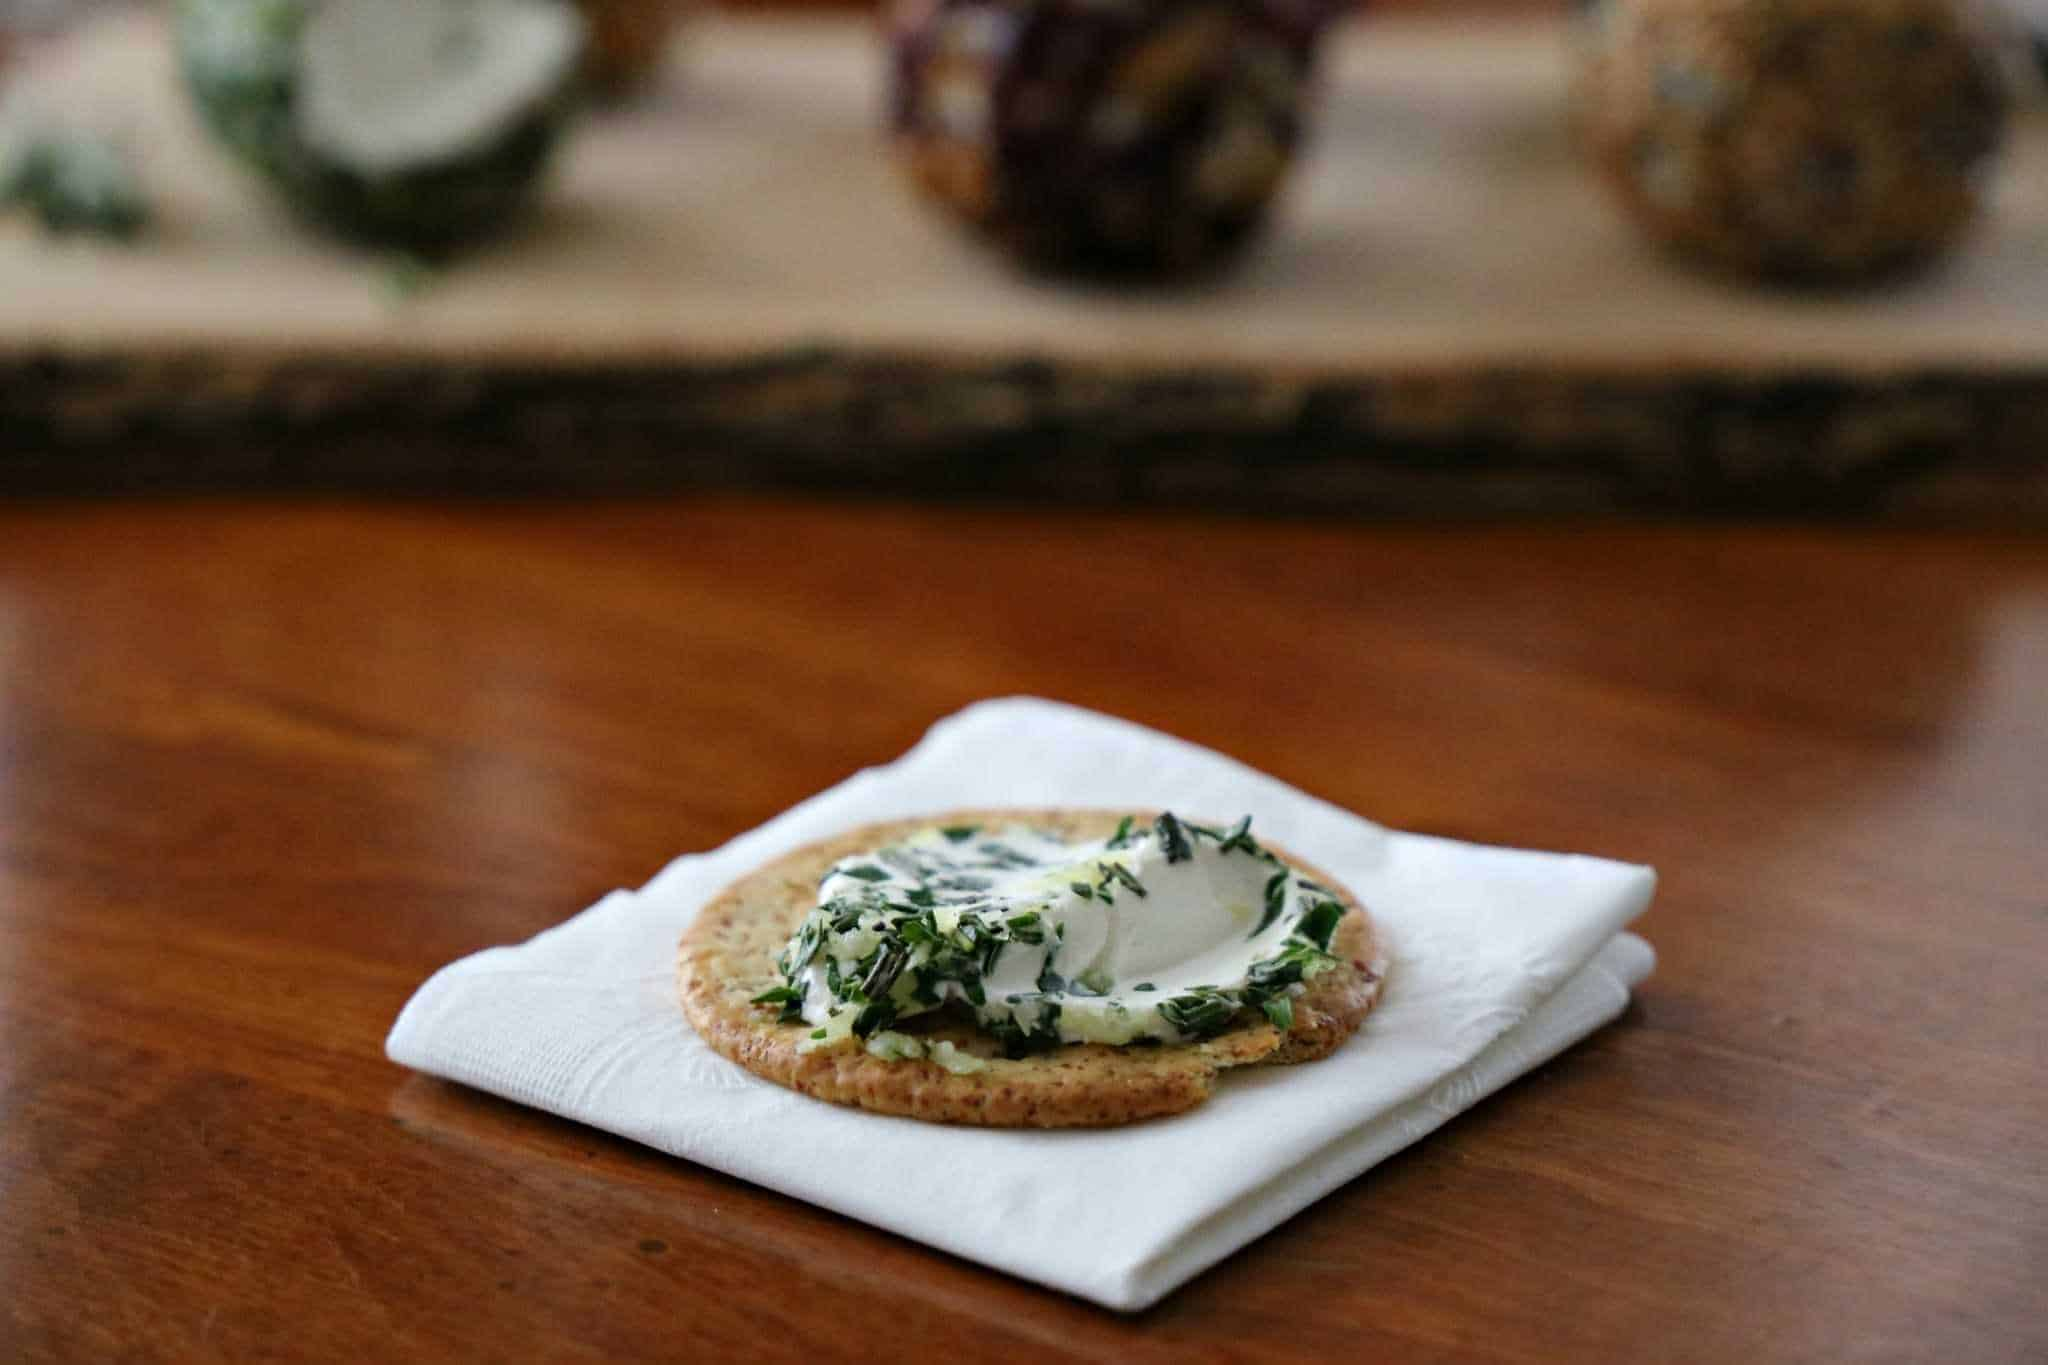 Savory mini cheeseball on cracker